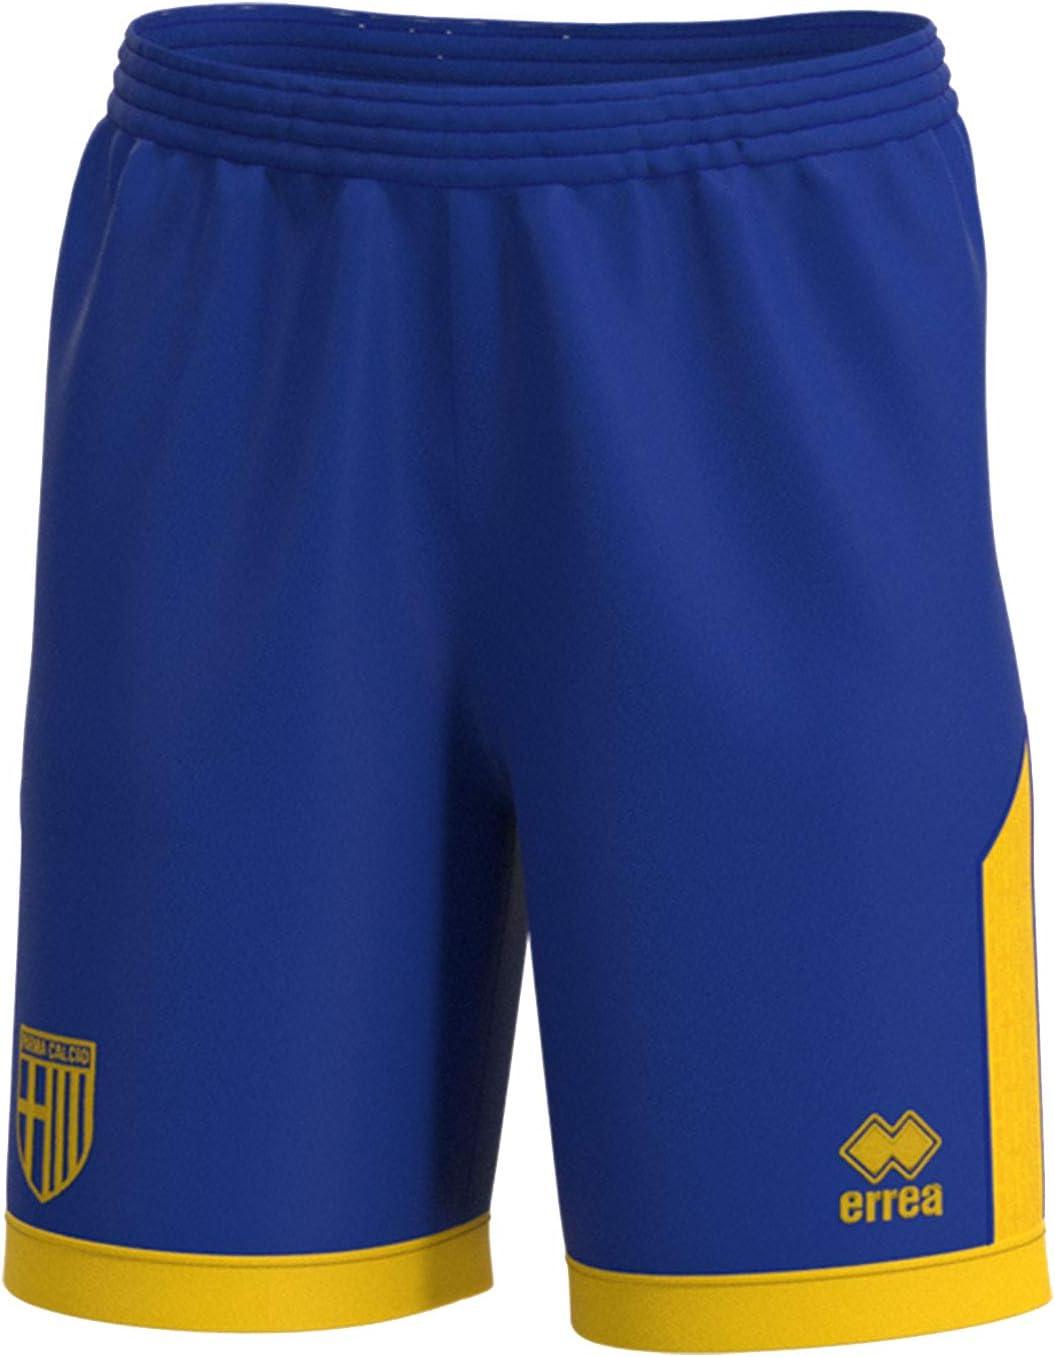 Parma Calcio Pantaloncini Gara Away Blu 20-21 Unisex adulto PARMA CALCIO 1913